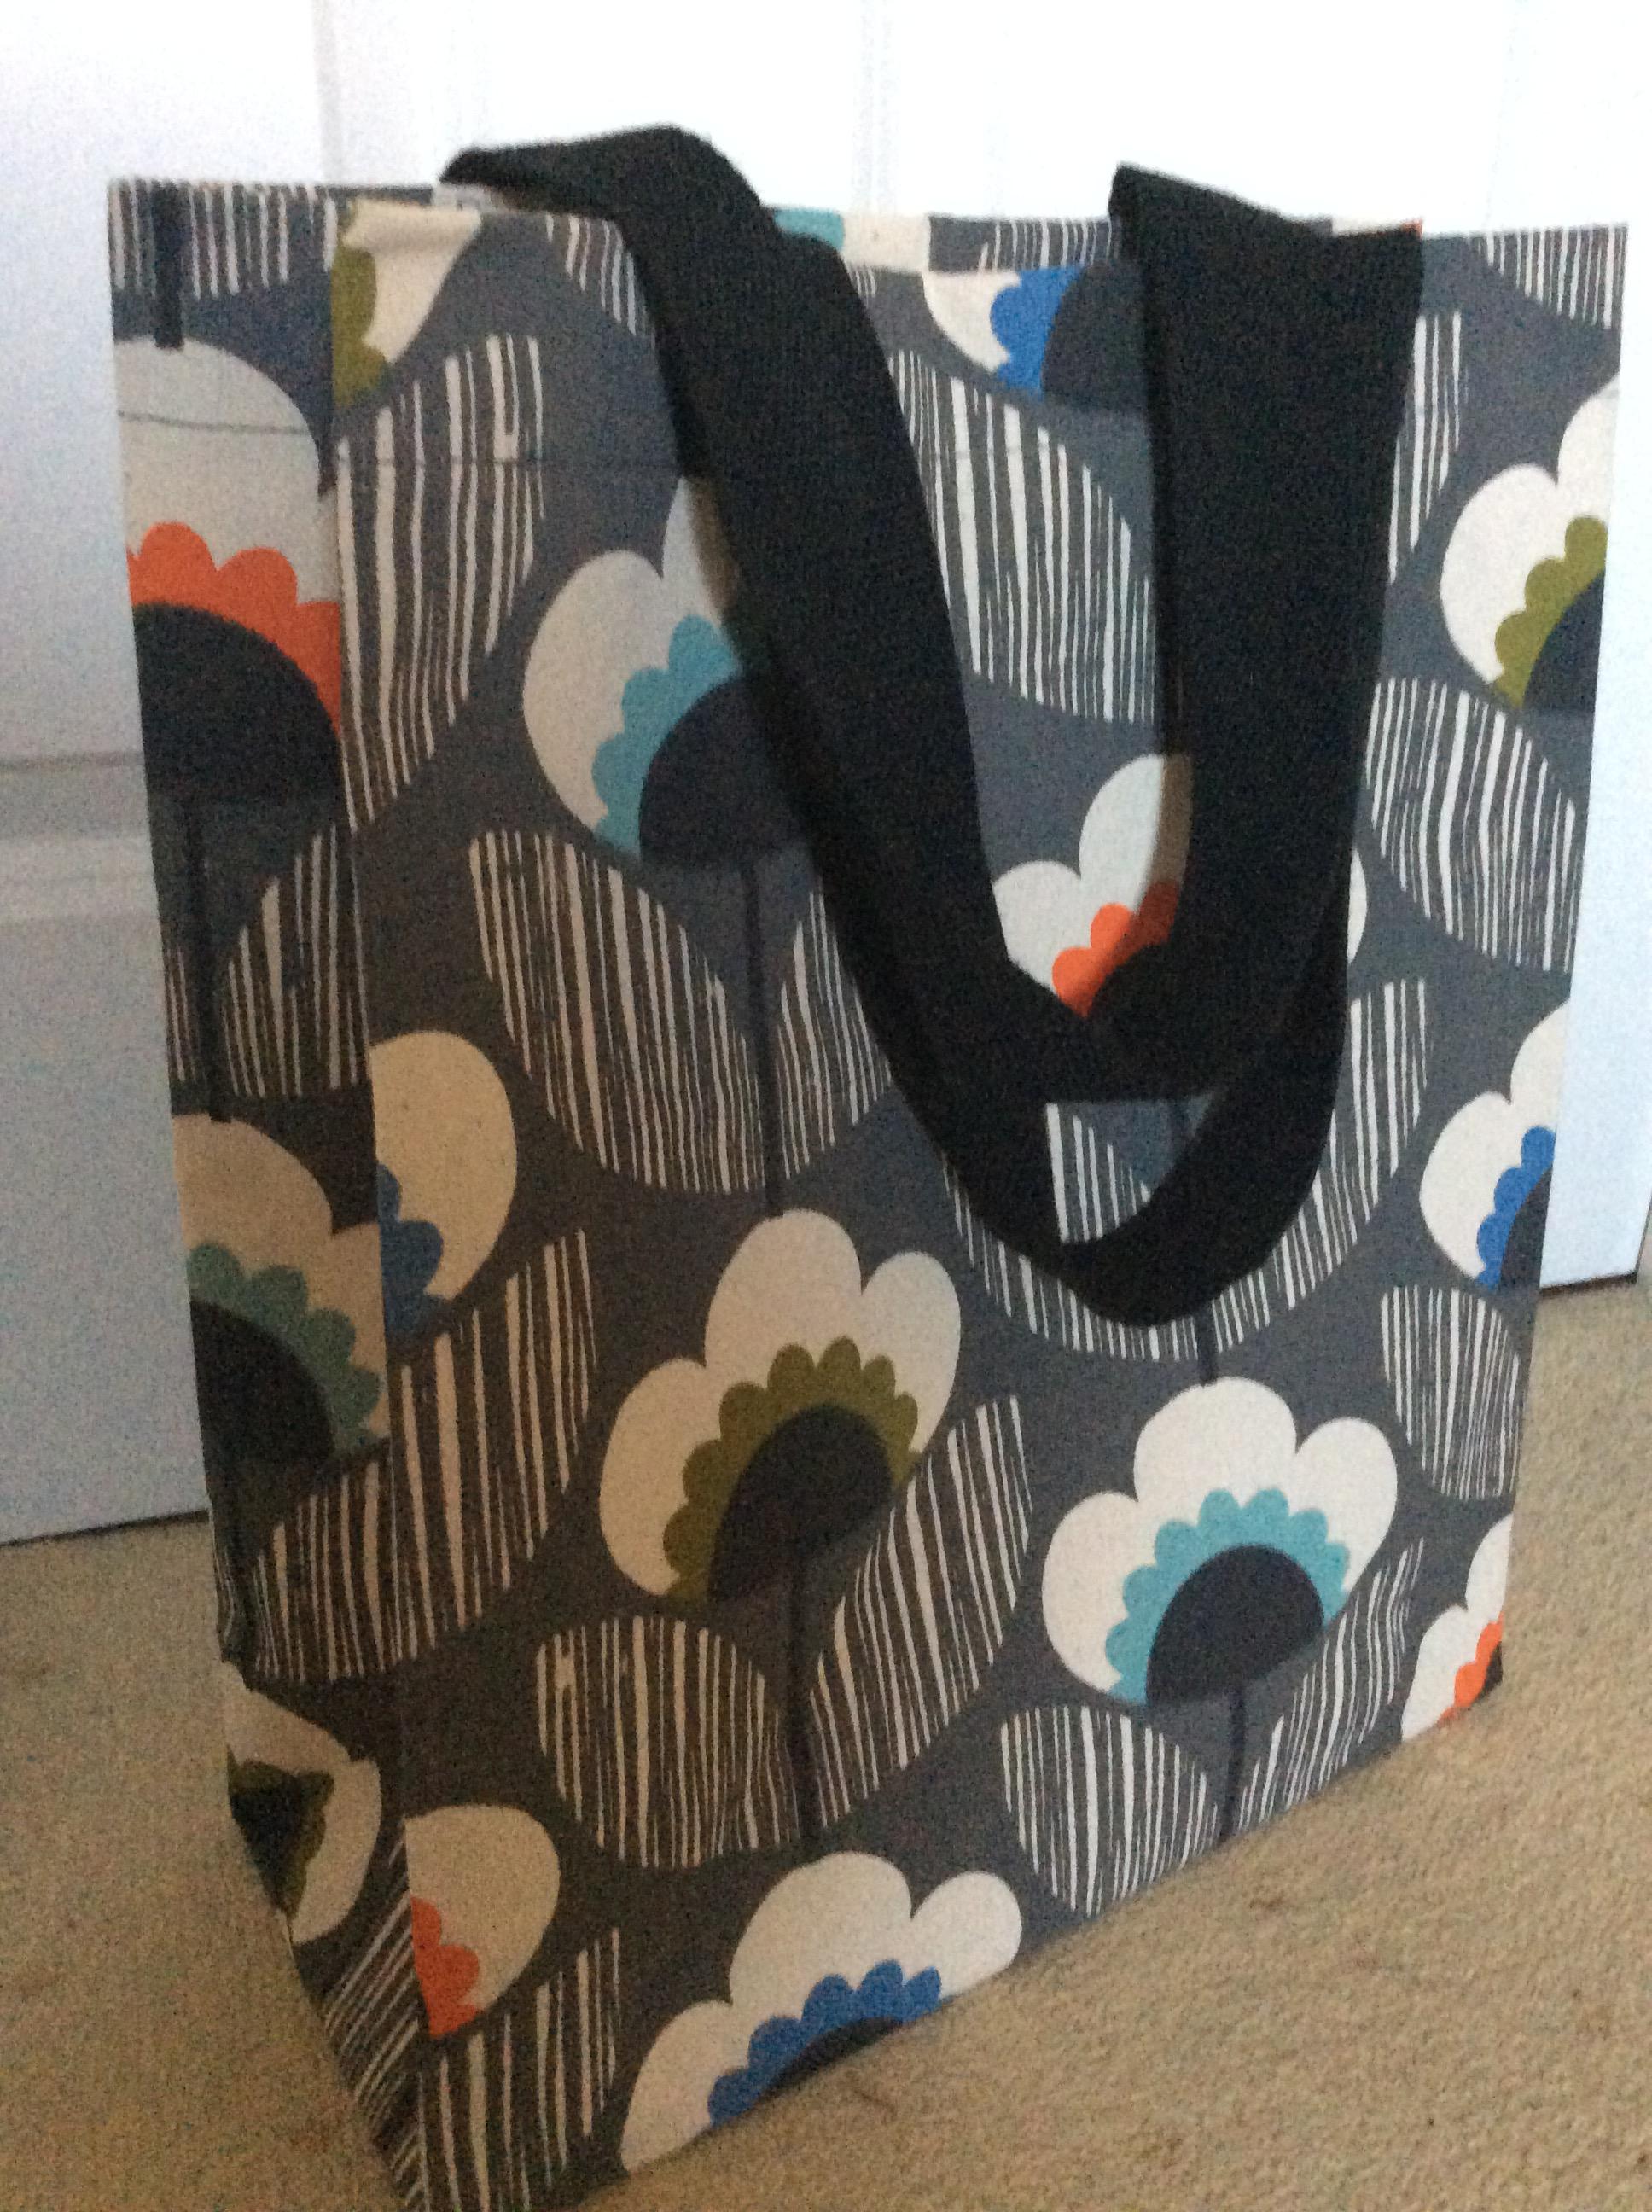 Tesco Orla Kiely Shopping Bags £5 instore